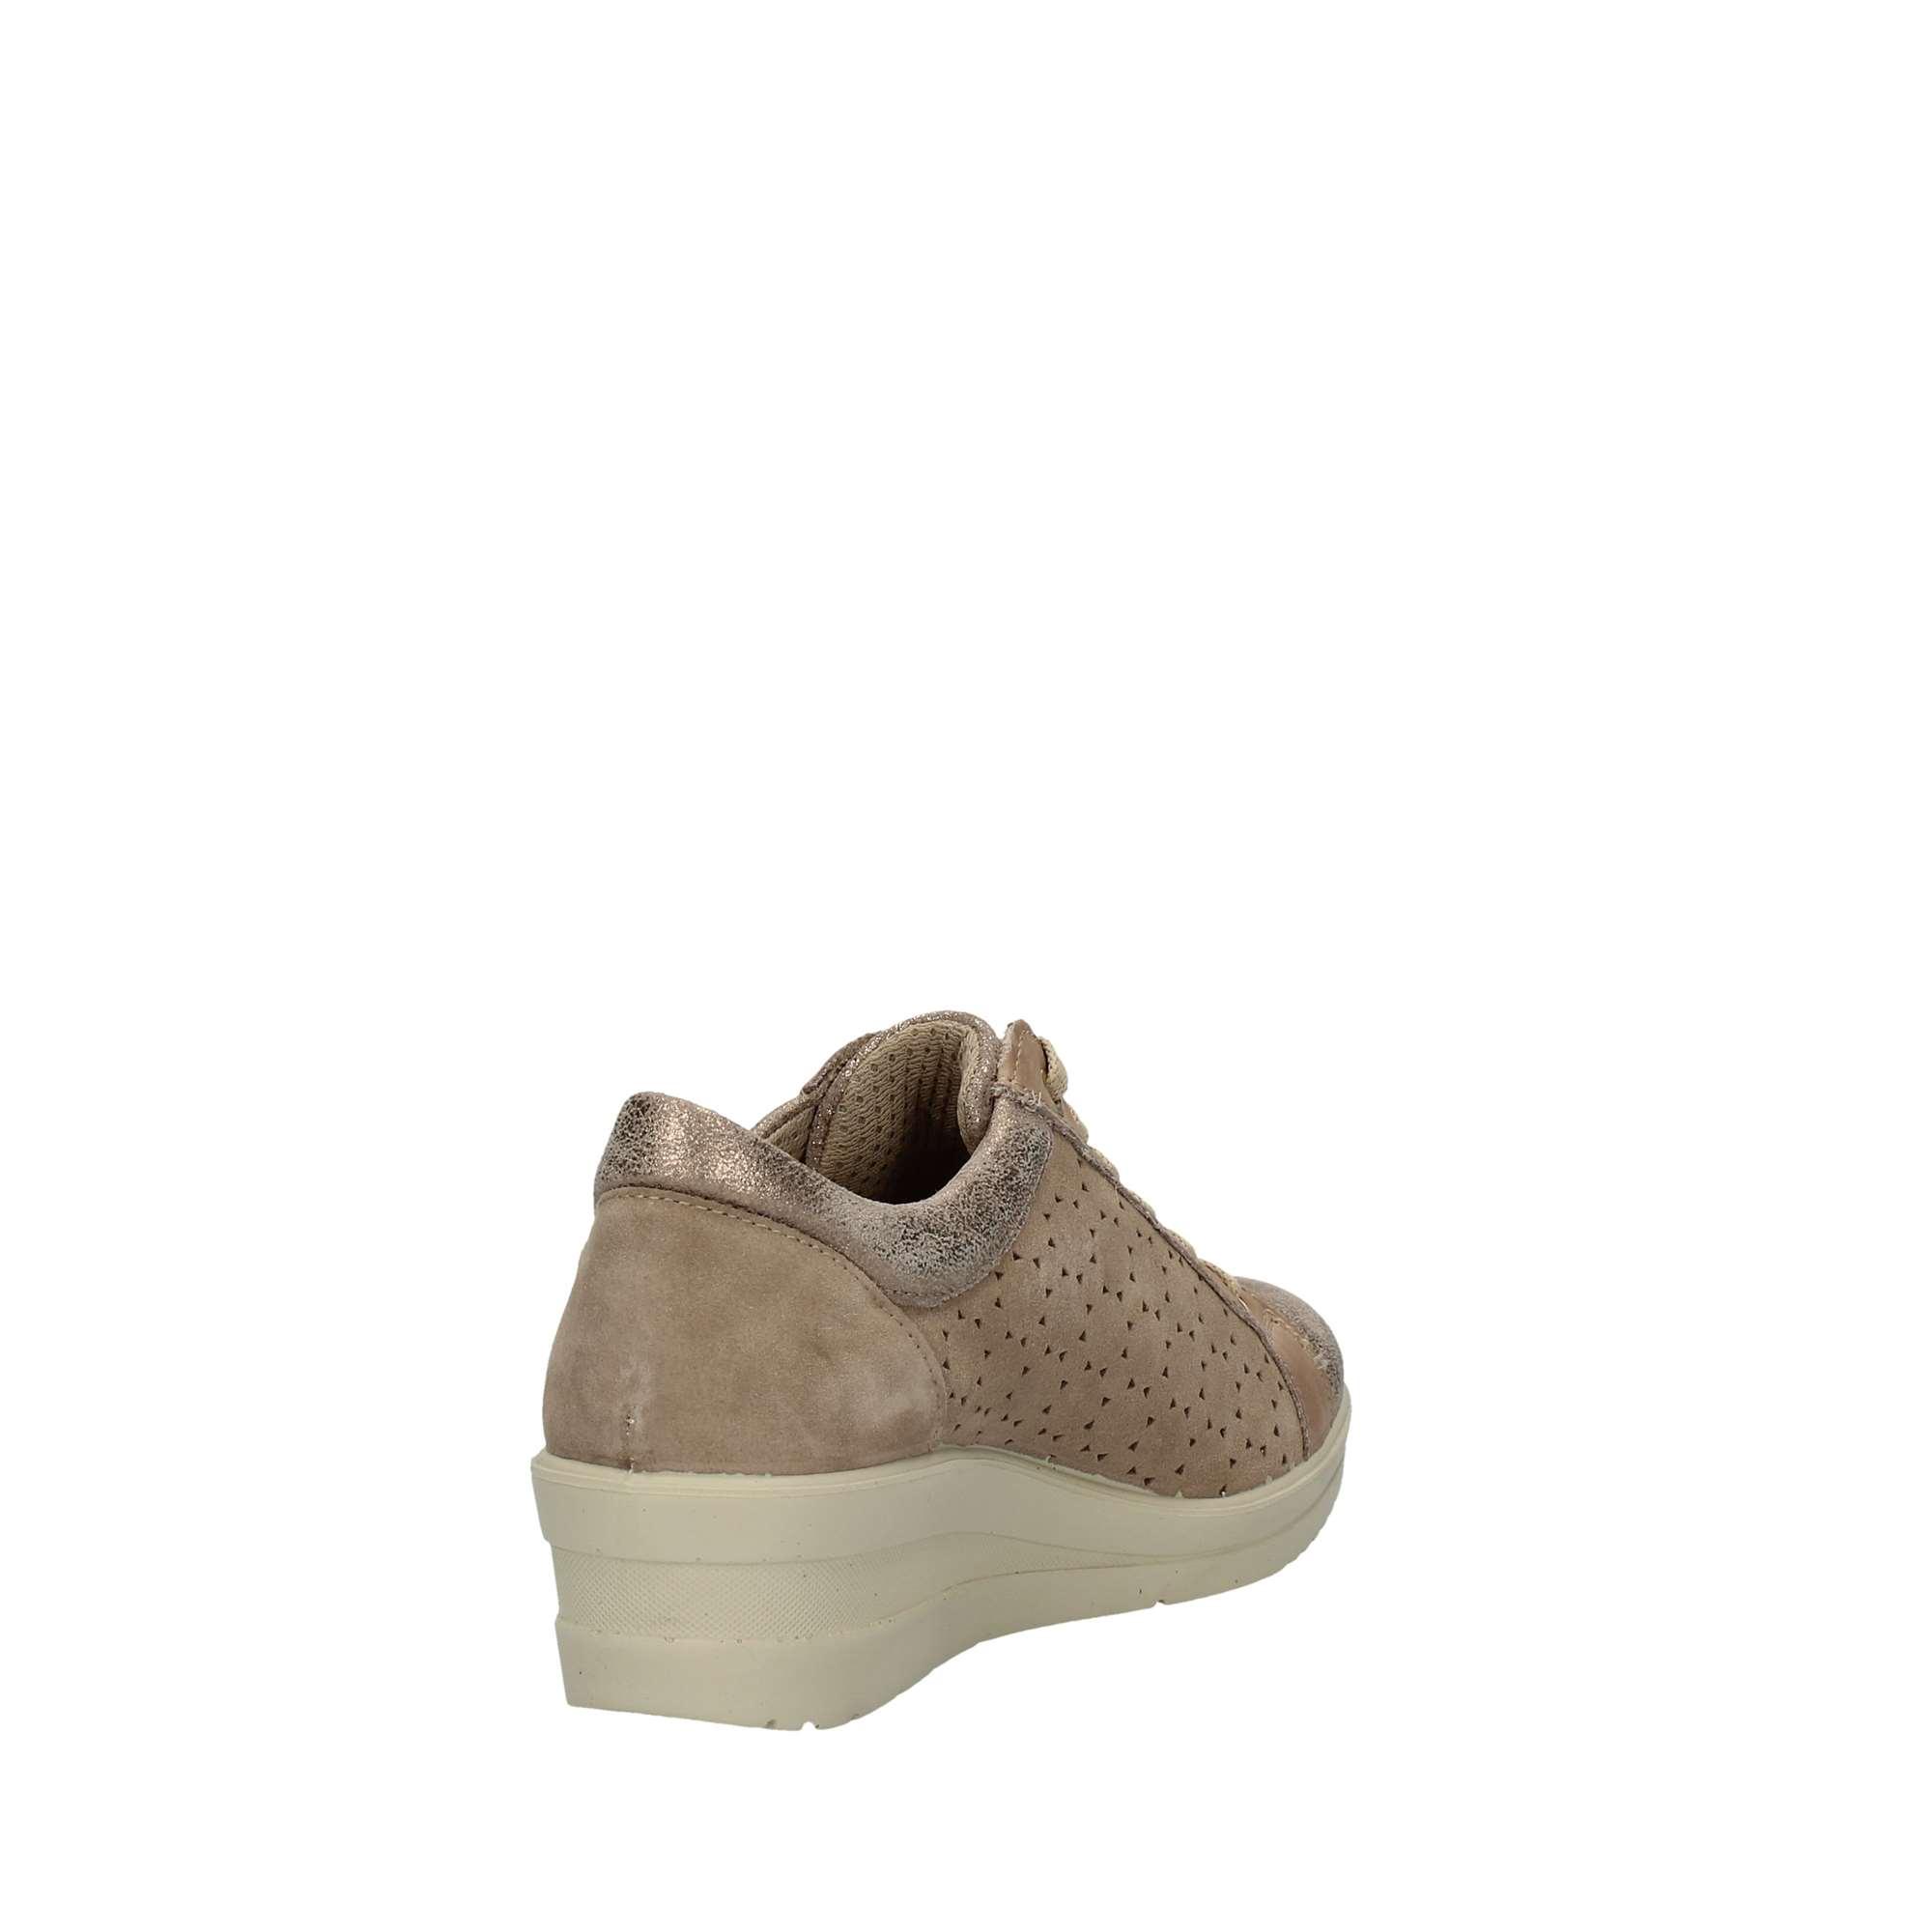 Damenschuhe estate Primavera 106430 Imac tTywY Sneakers D tTywY Imac 58edc0